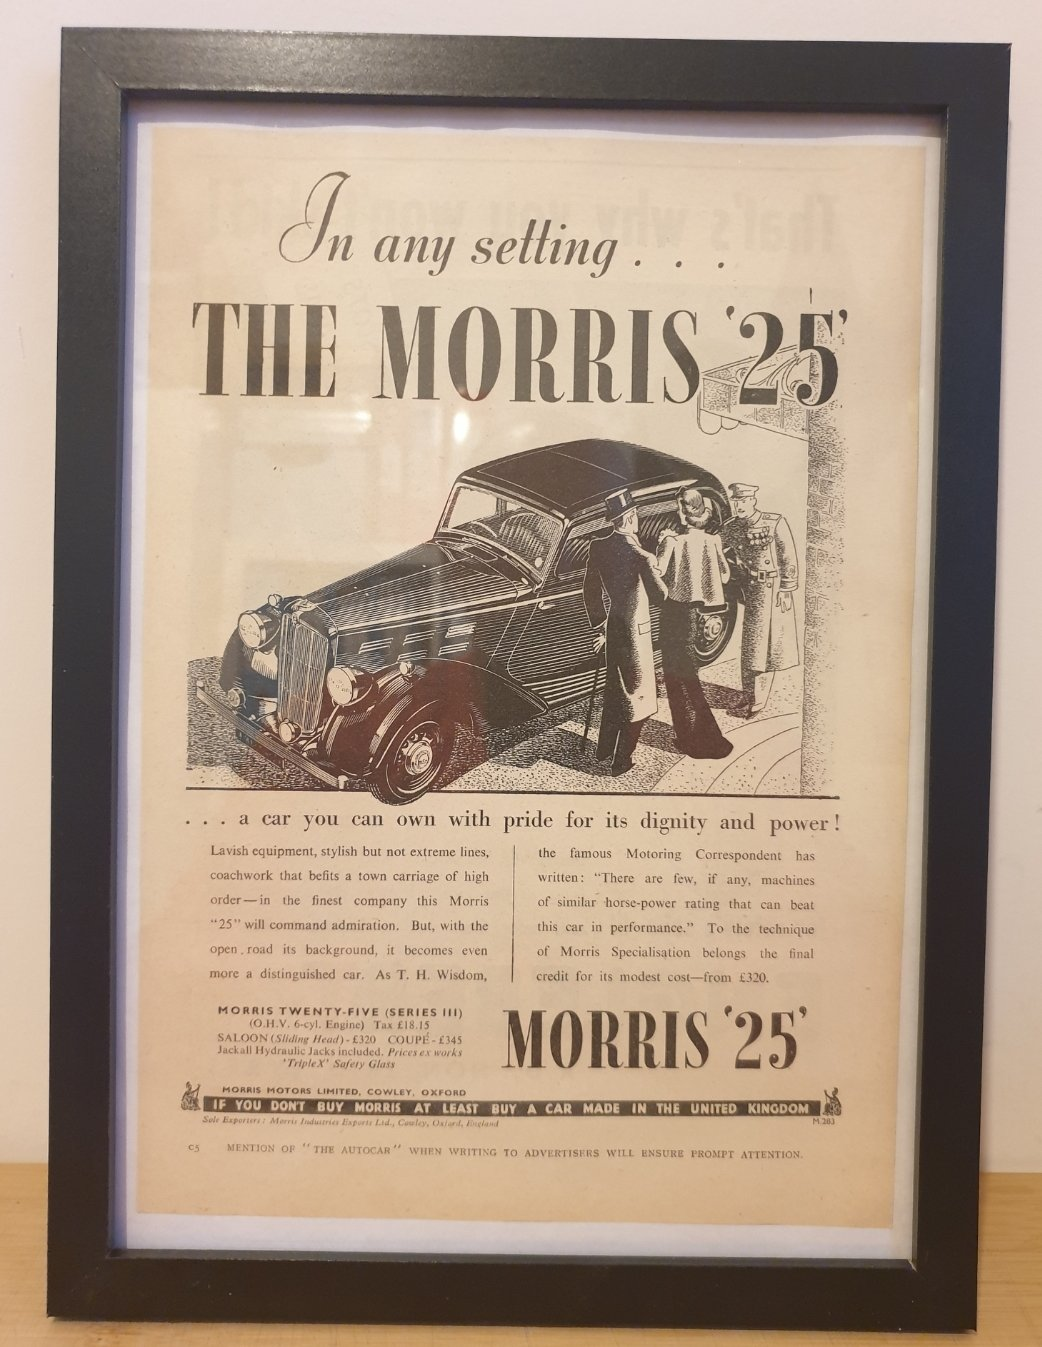 Original 1938 Morris 25 Framed Advert